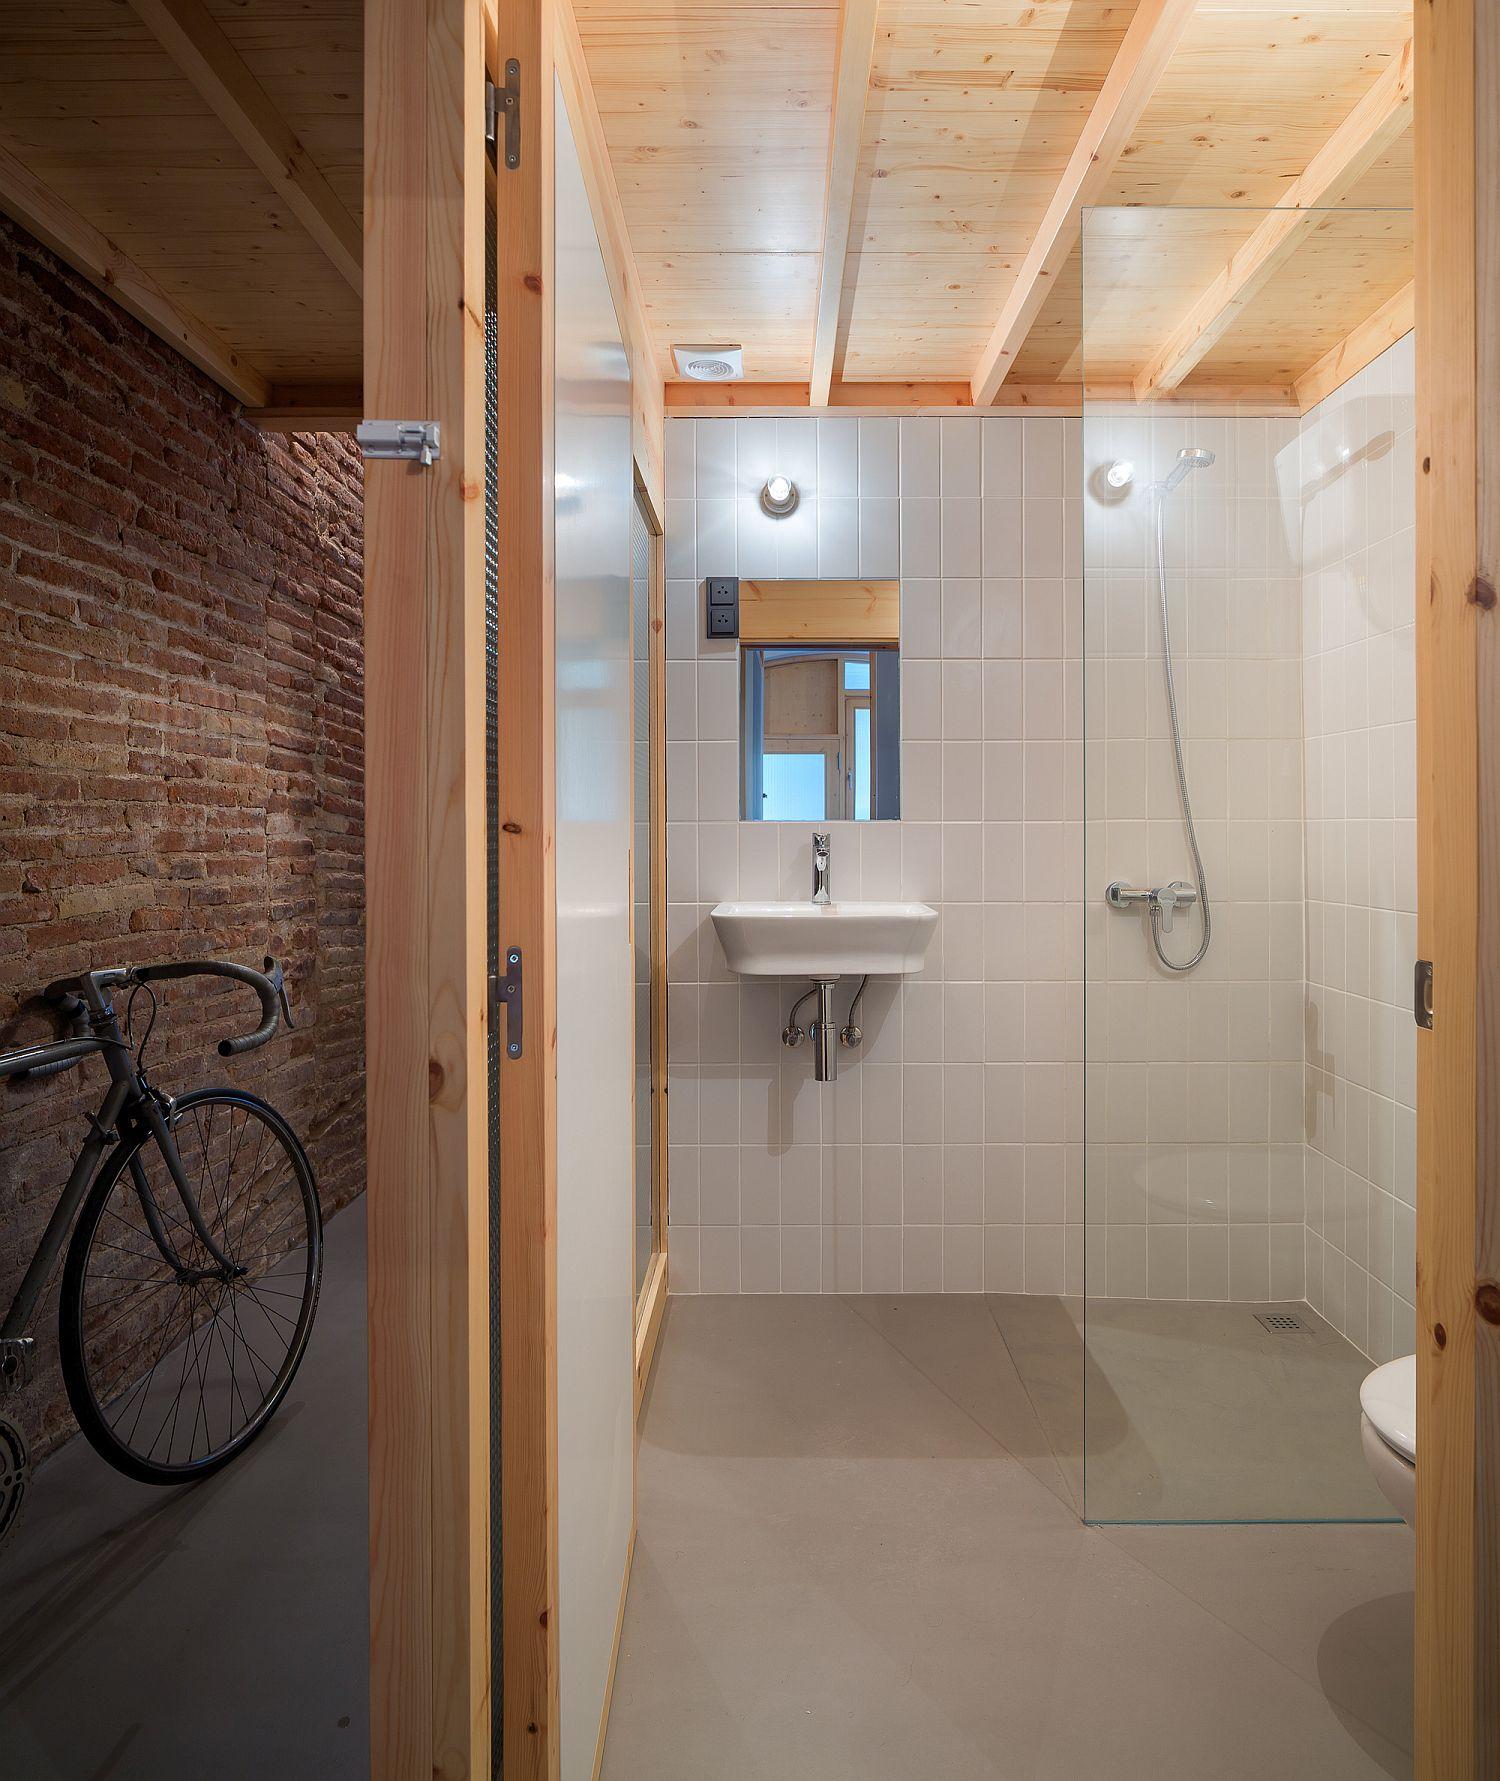 Space-savvy bathroom design with translucent sliding doors